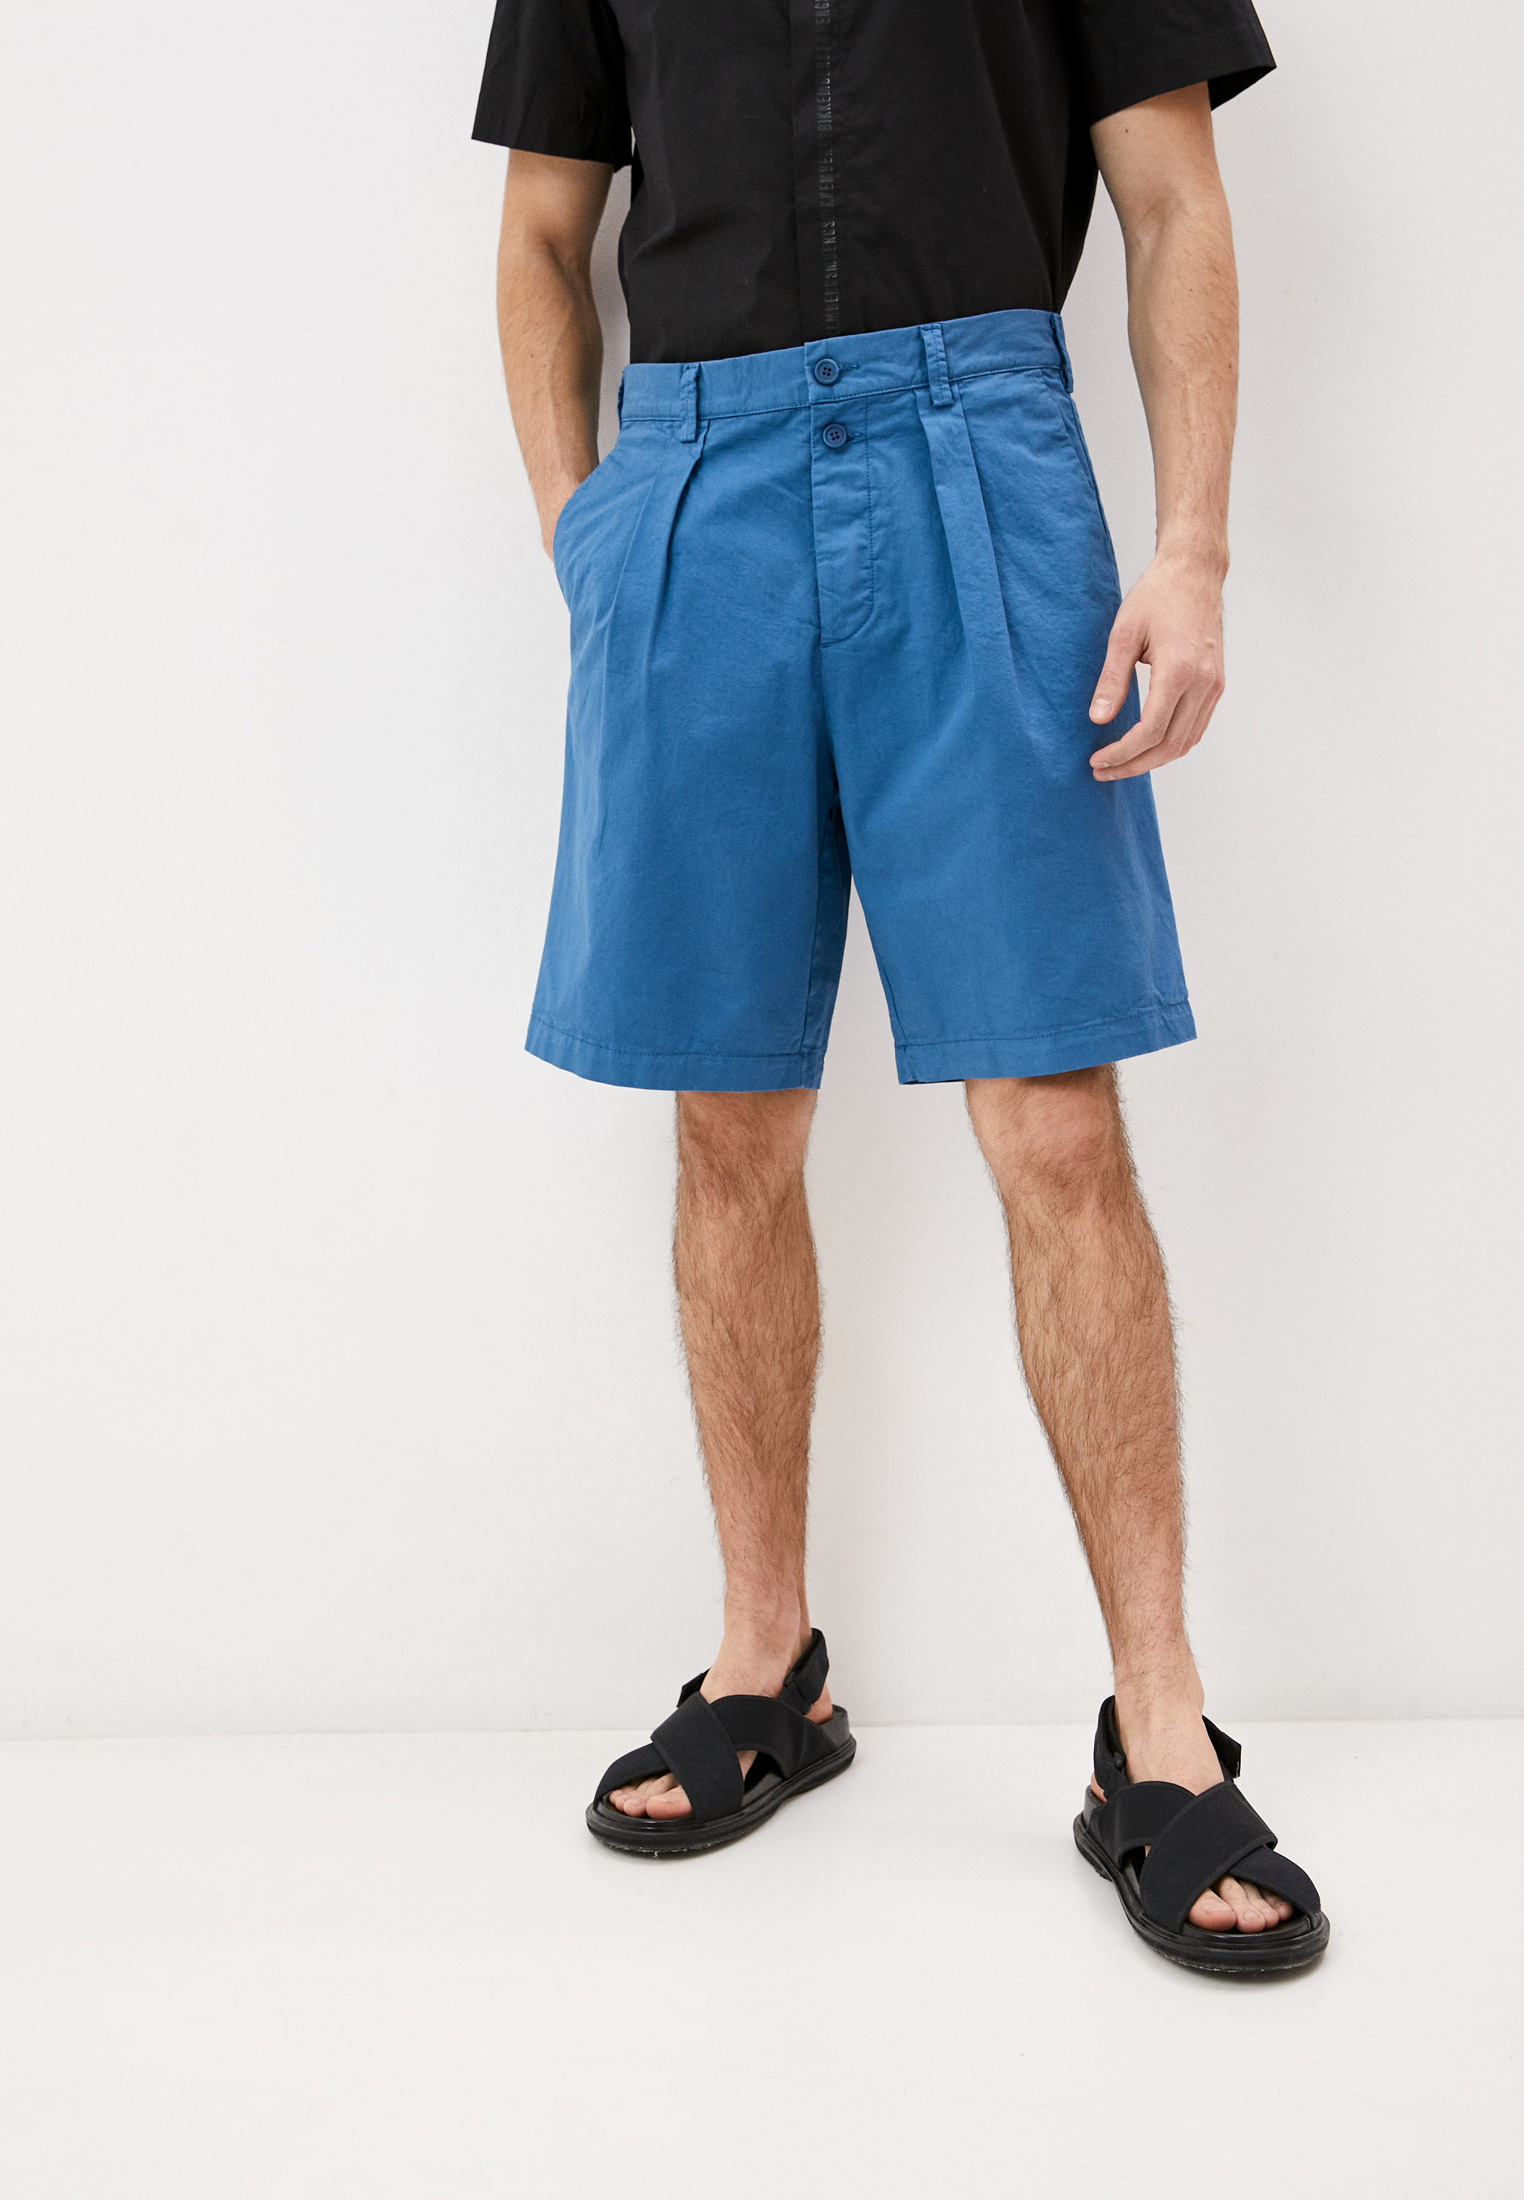 Мужские повседневные шорты Bikkembergs (Биккембергс) CO02300S3389X38